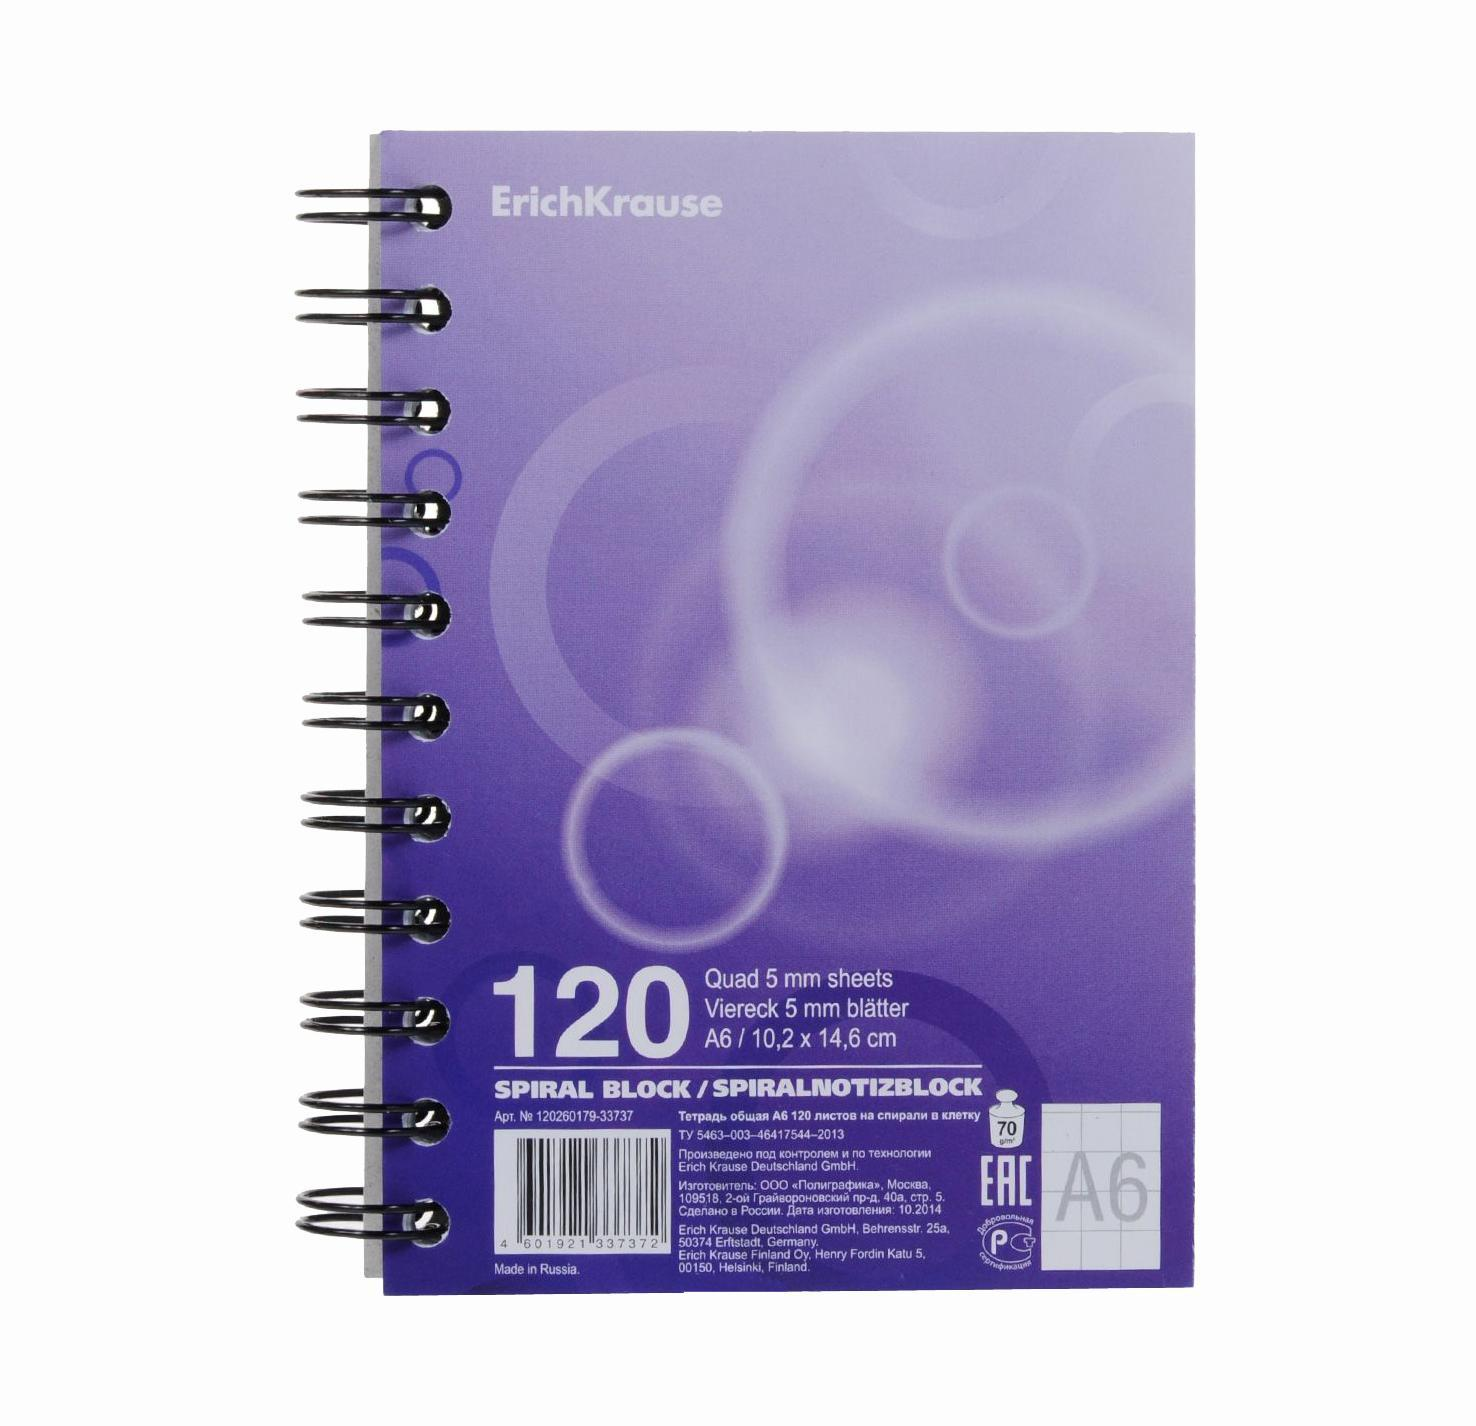 Тетрадь на спирали А6, 120л Spiral Block 3,цвет: фиолетовый160Ттр4B1сп_03845тетрадь на спирали А6,120л Spiral Block 3, цвет: фиолетовый